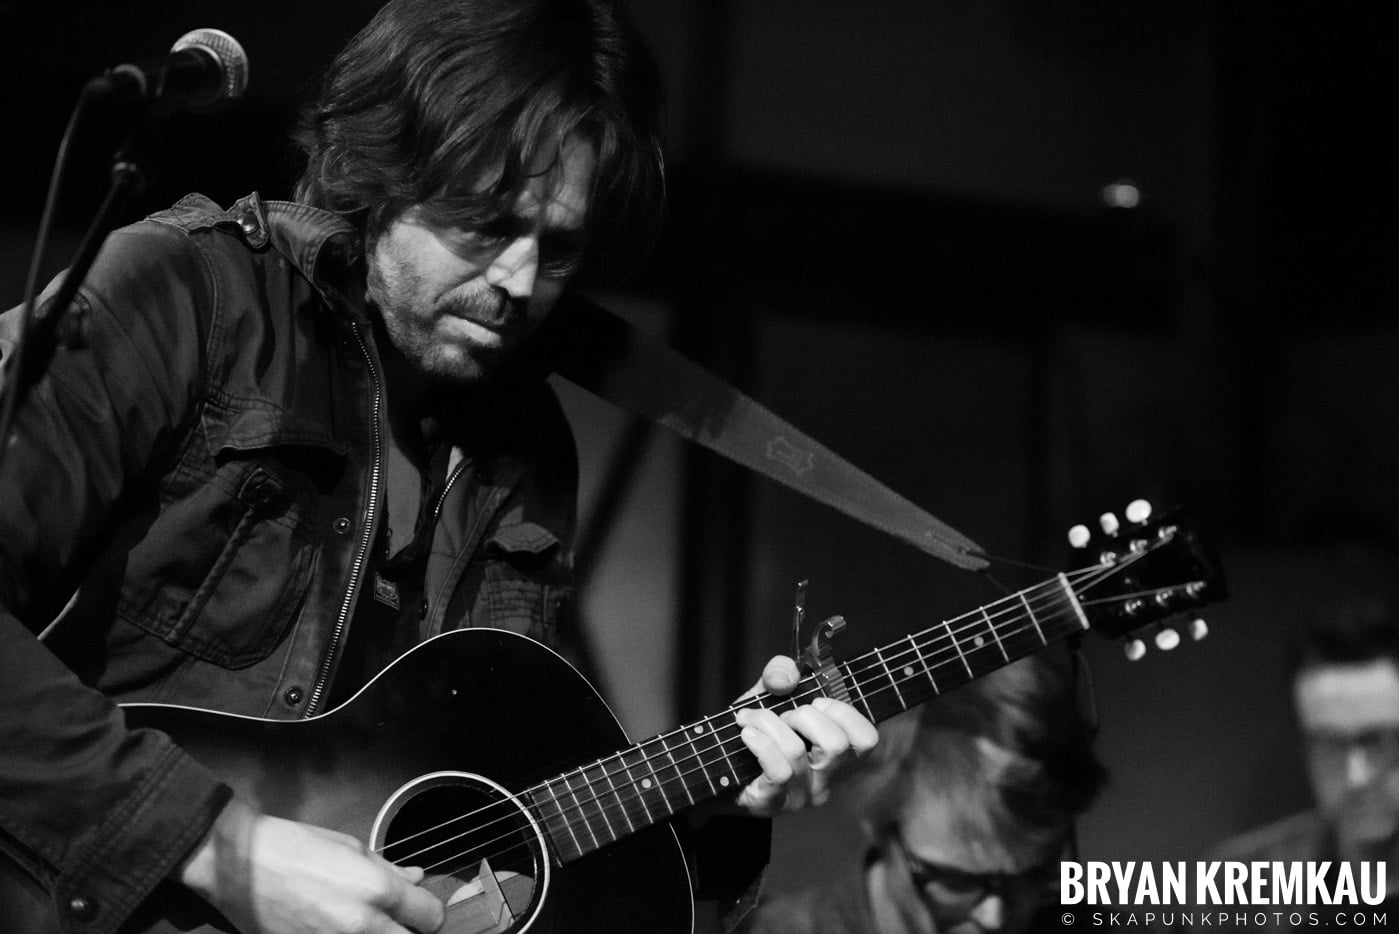 Peter Bradley Adams @ Rockwood Music Hall, NYC - 3.9.13 (19)